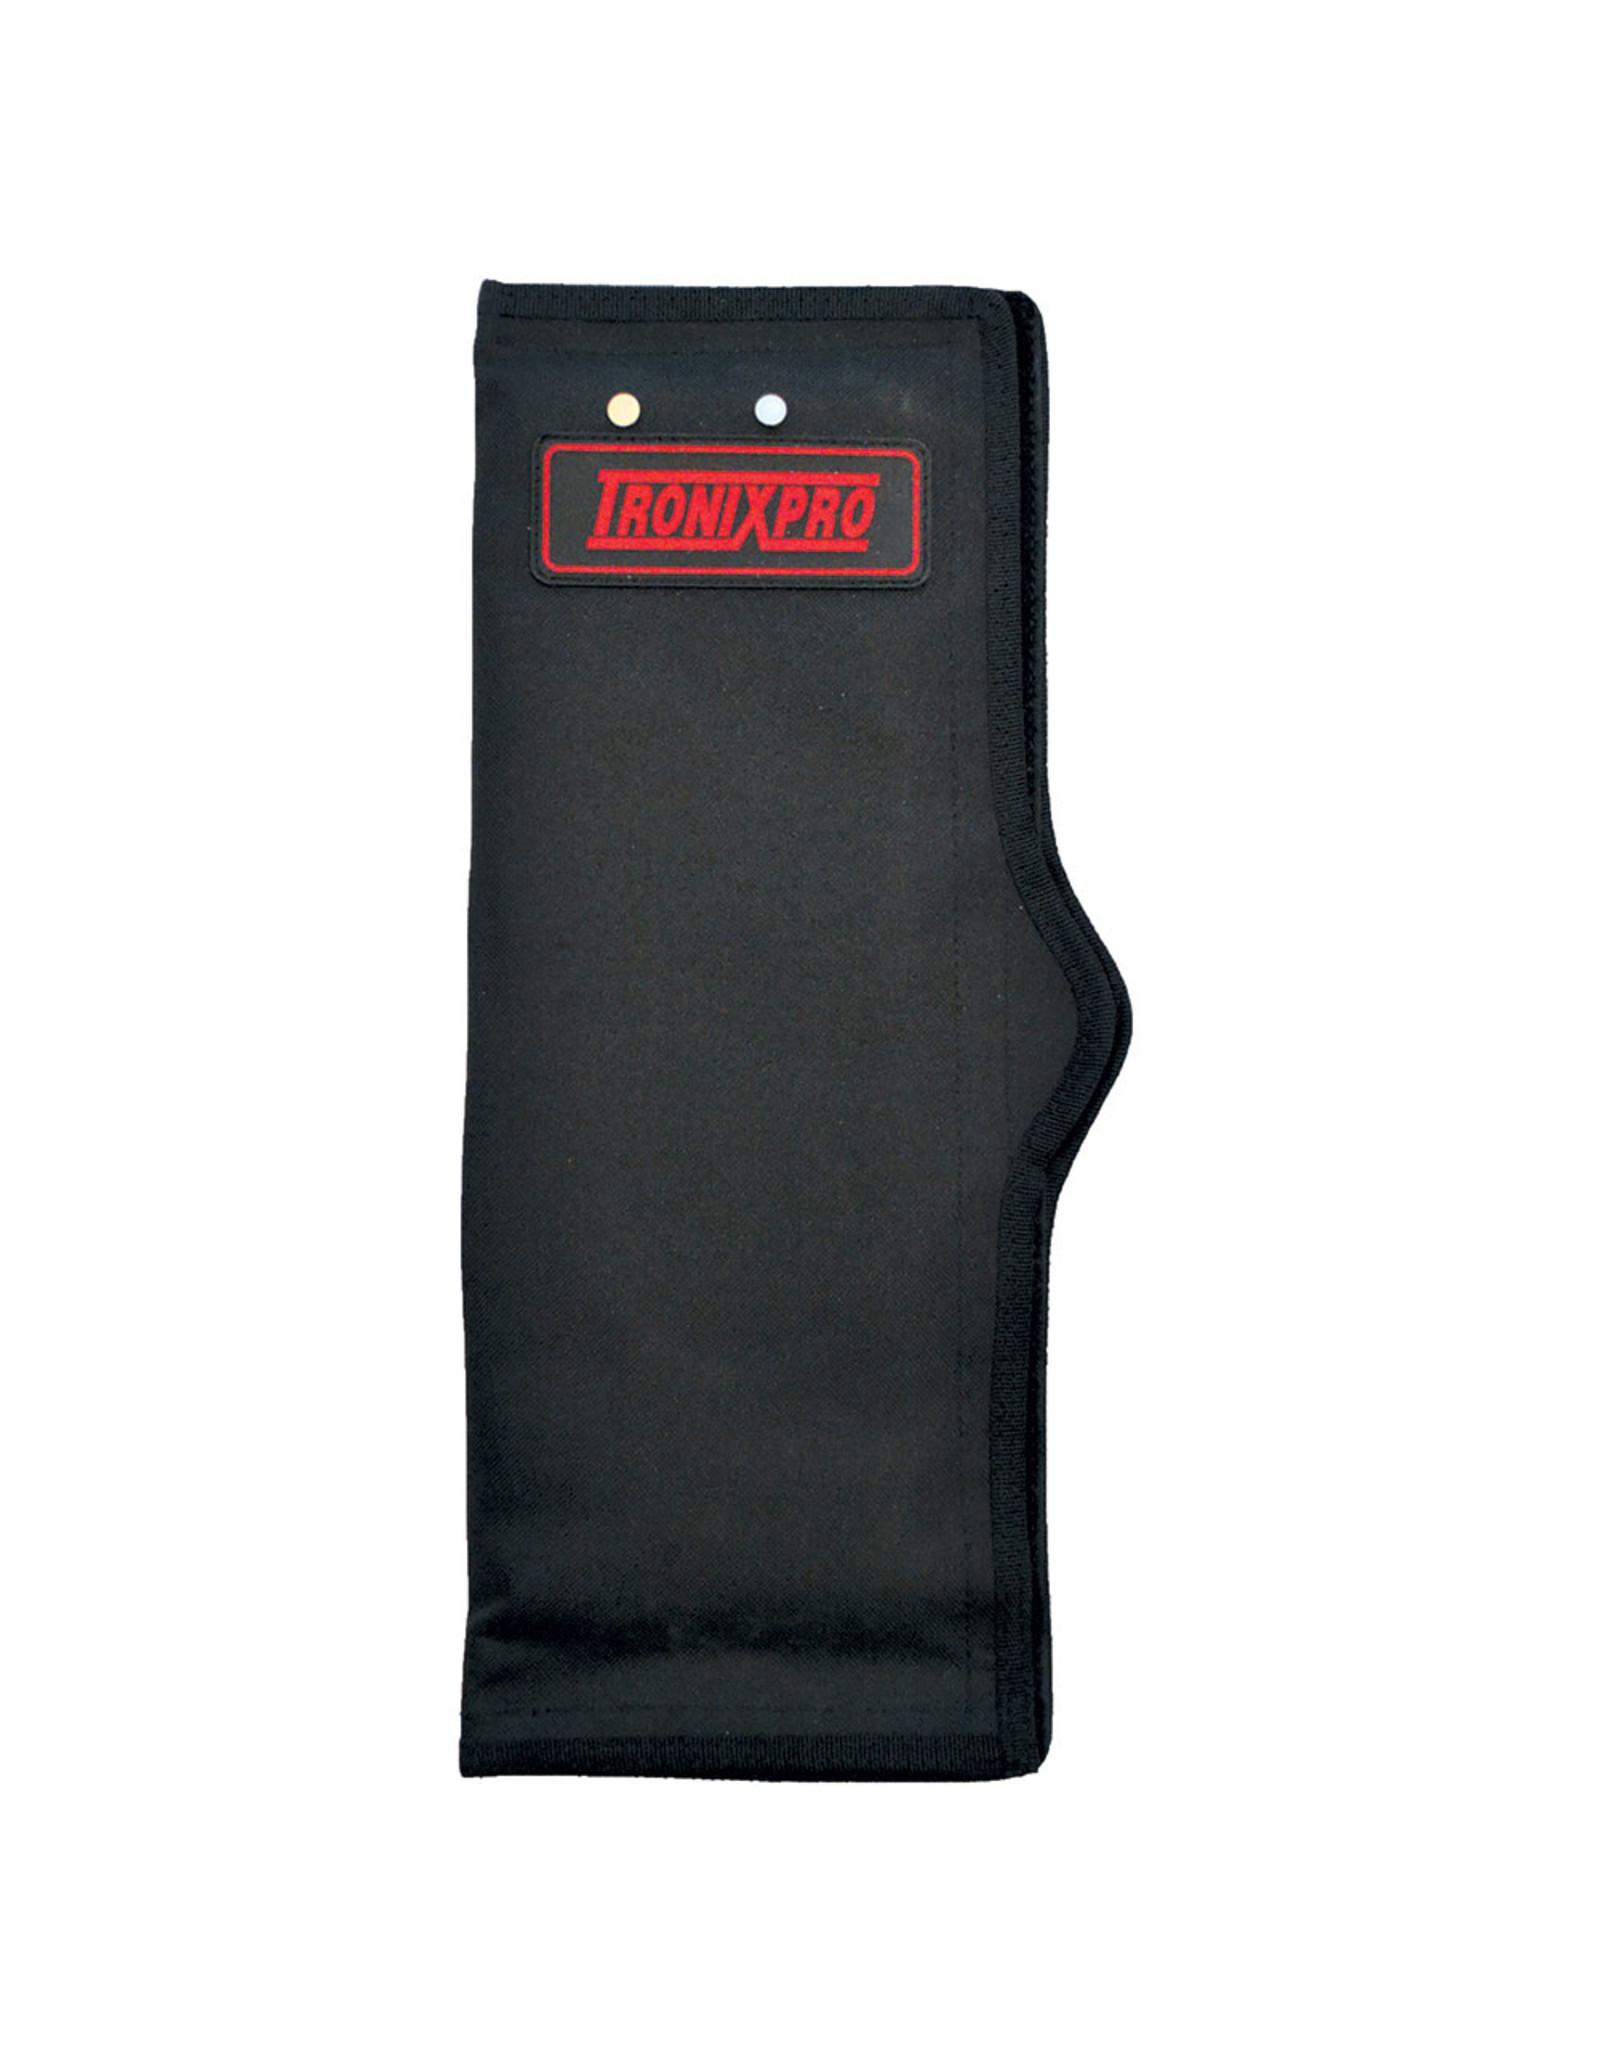 Tronix Tronixpro Boom Rig Wallet